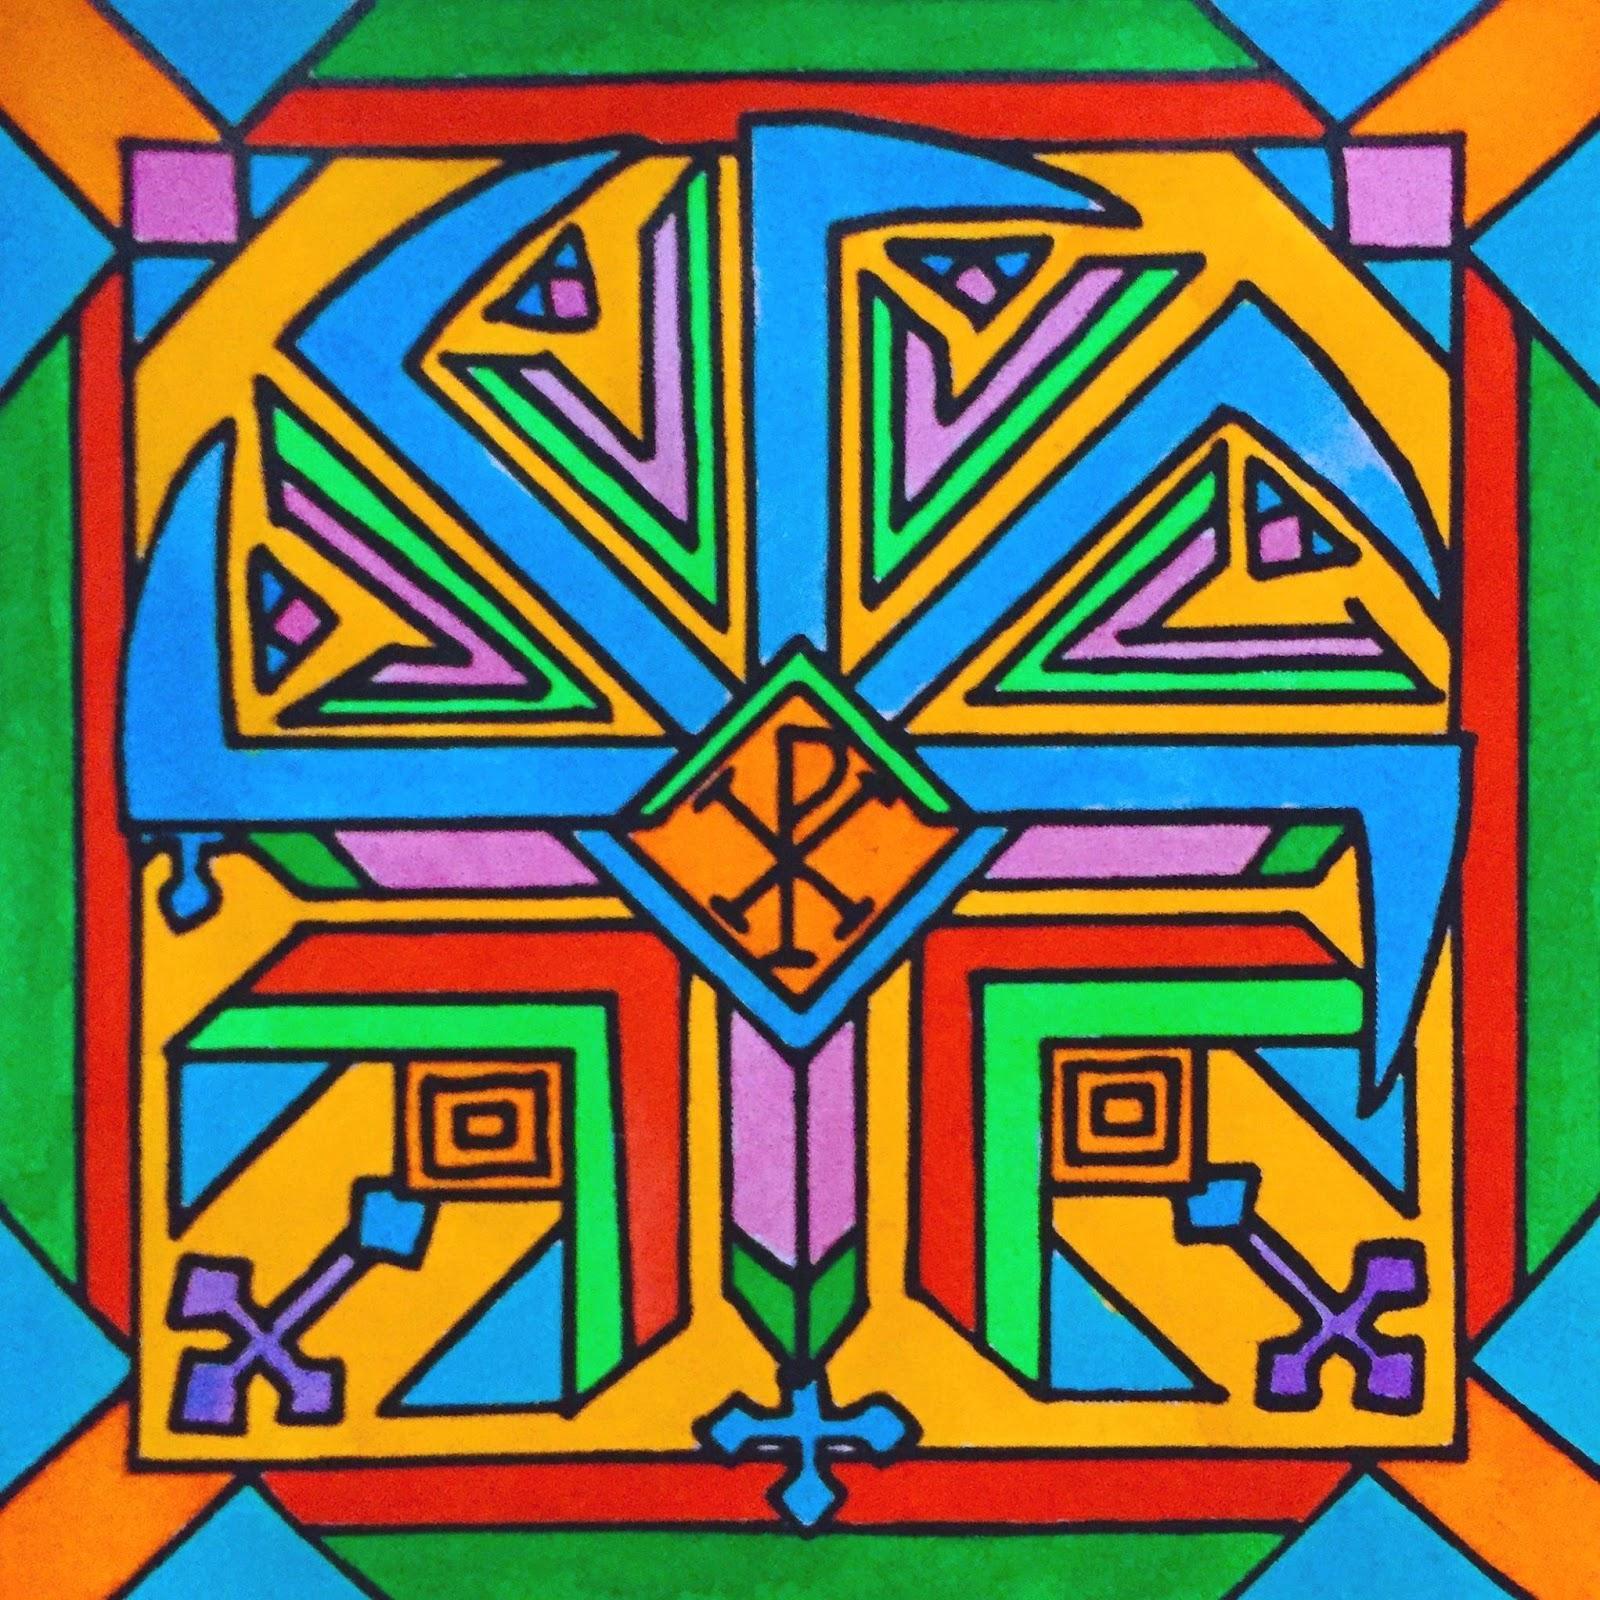 Slovanský ornament (symbol projektu; autor: Jan Hachran)